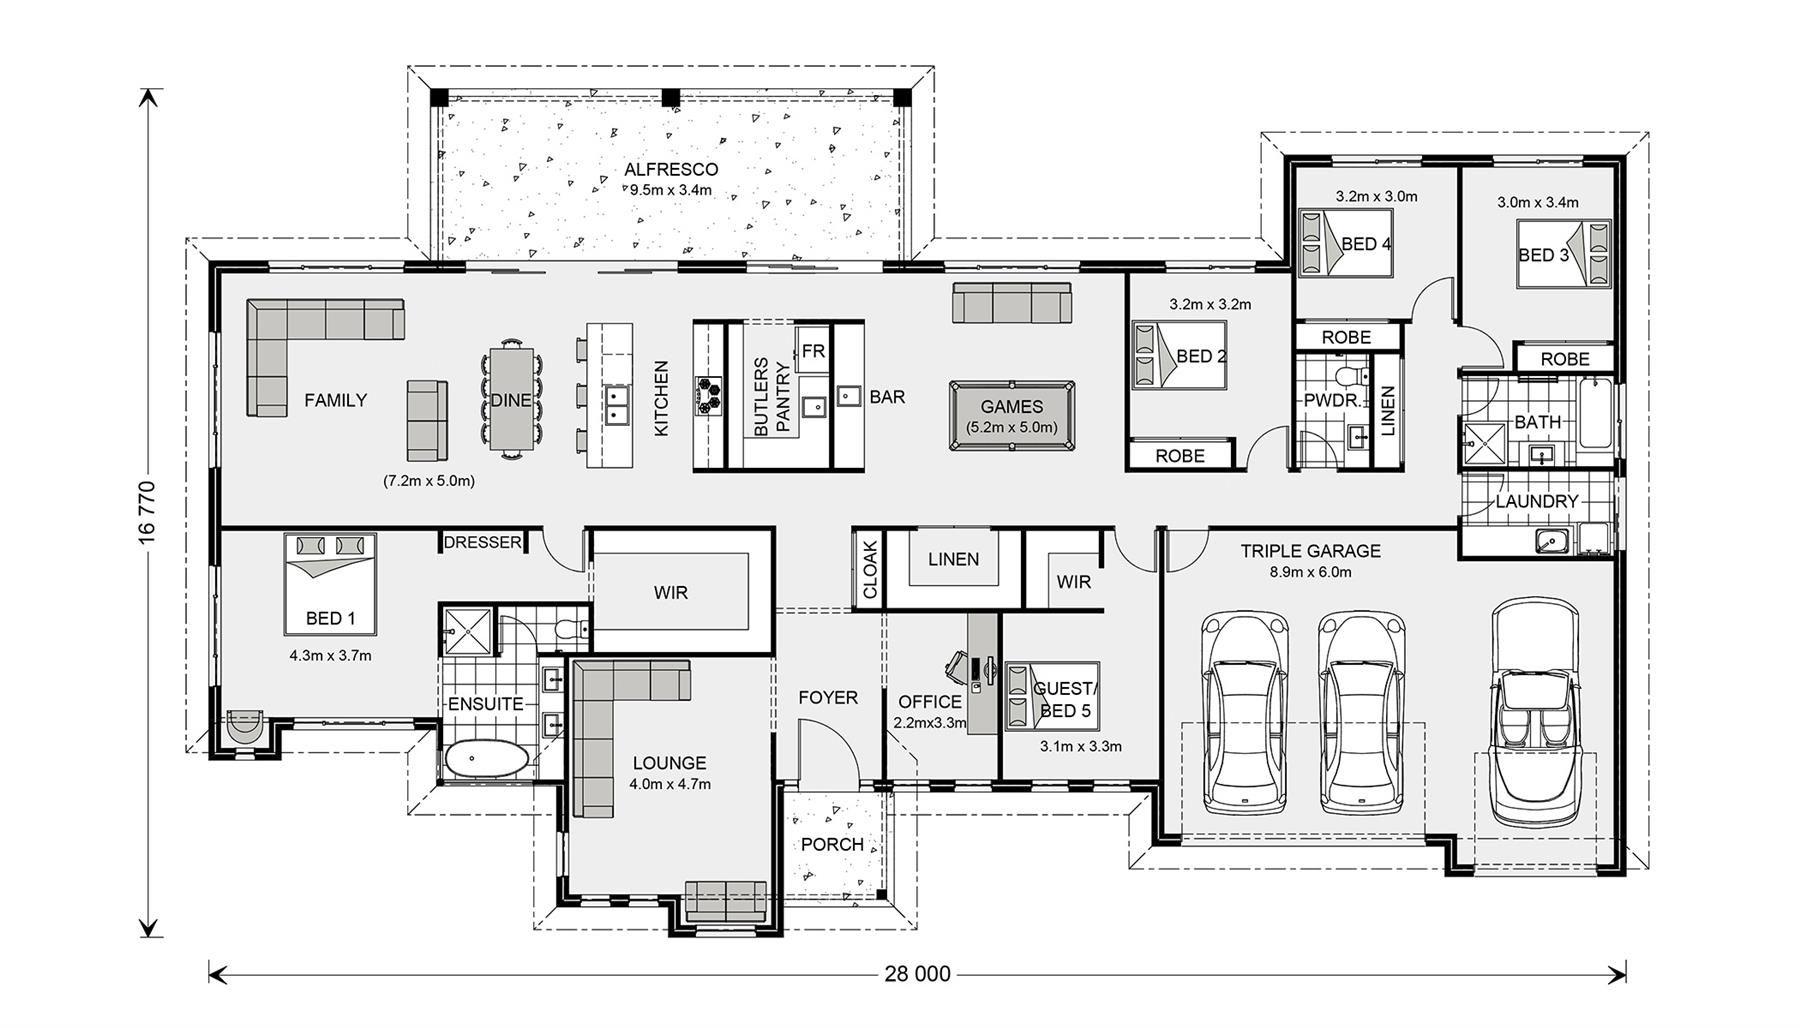 Lot 120 Eucalypt Rd, Inverleigh VIC 3321, Image 1